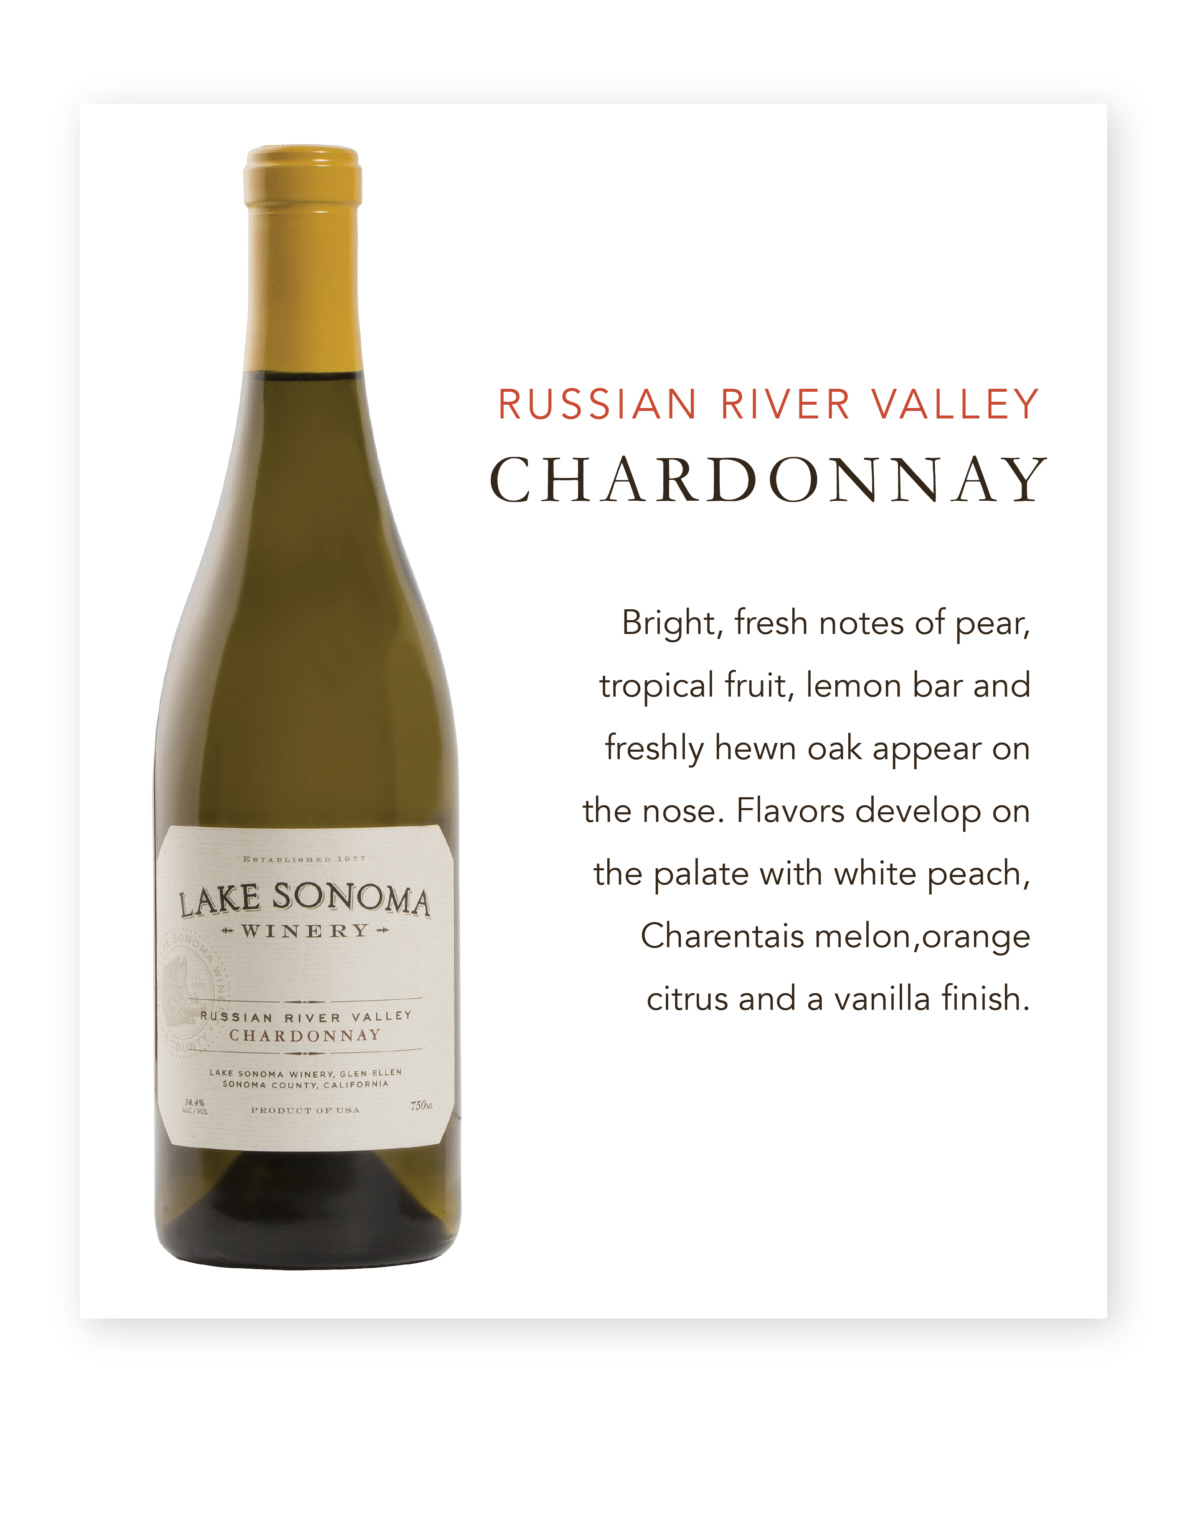 Lake Sonoma Russian River Chardonnay